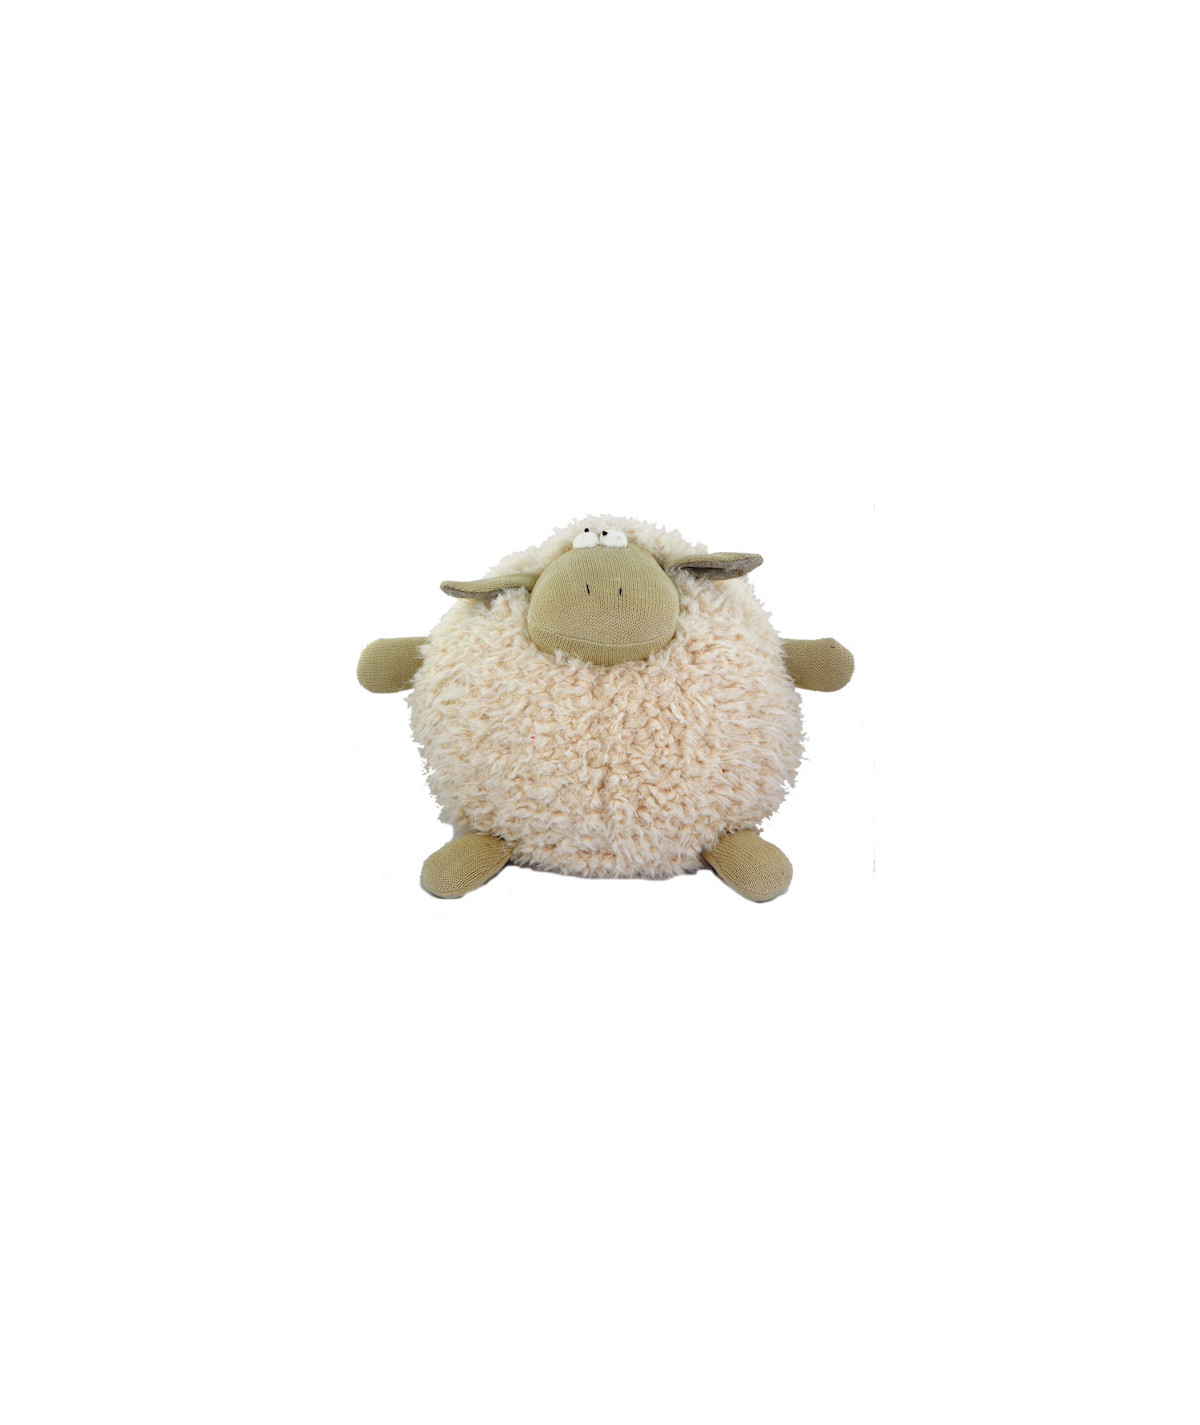 Peluche ronde en coton Diam30cm - Mouton rose |YESDEKO